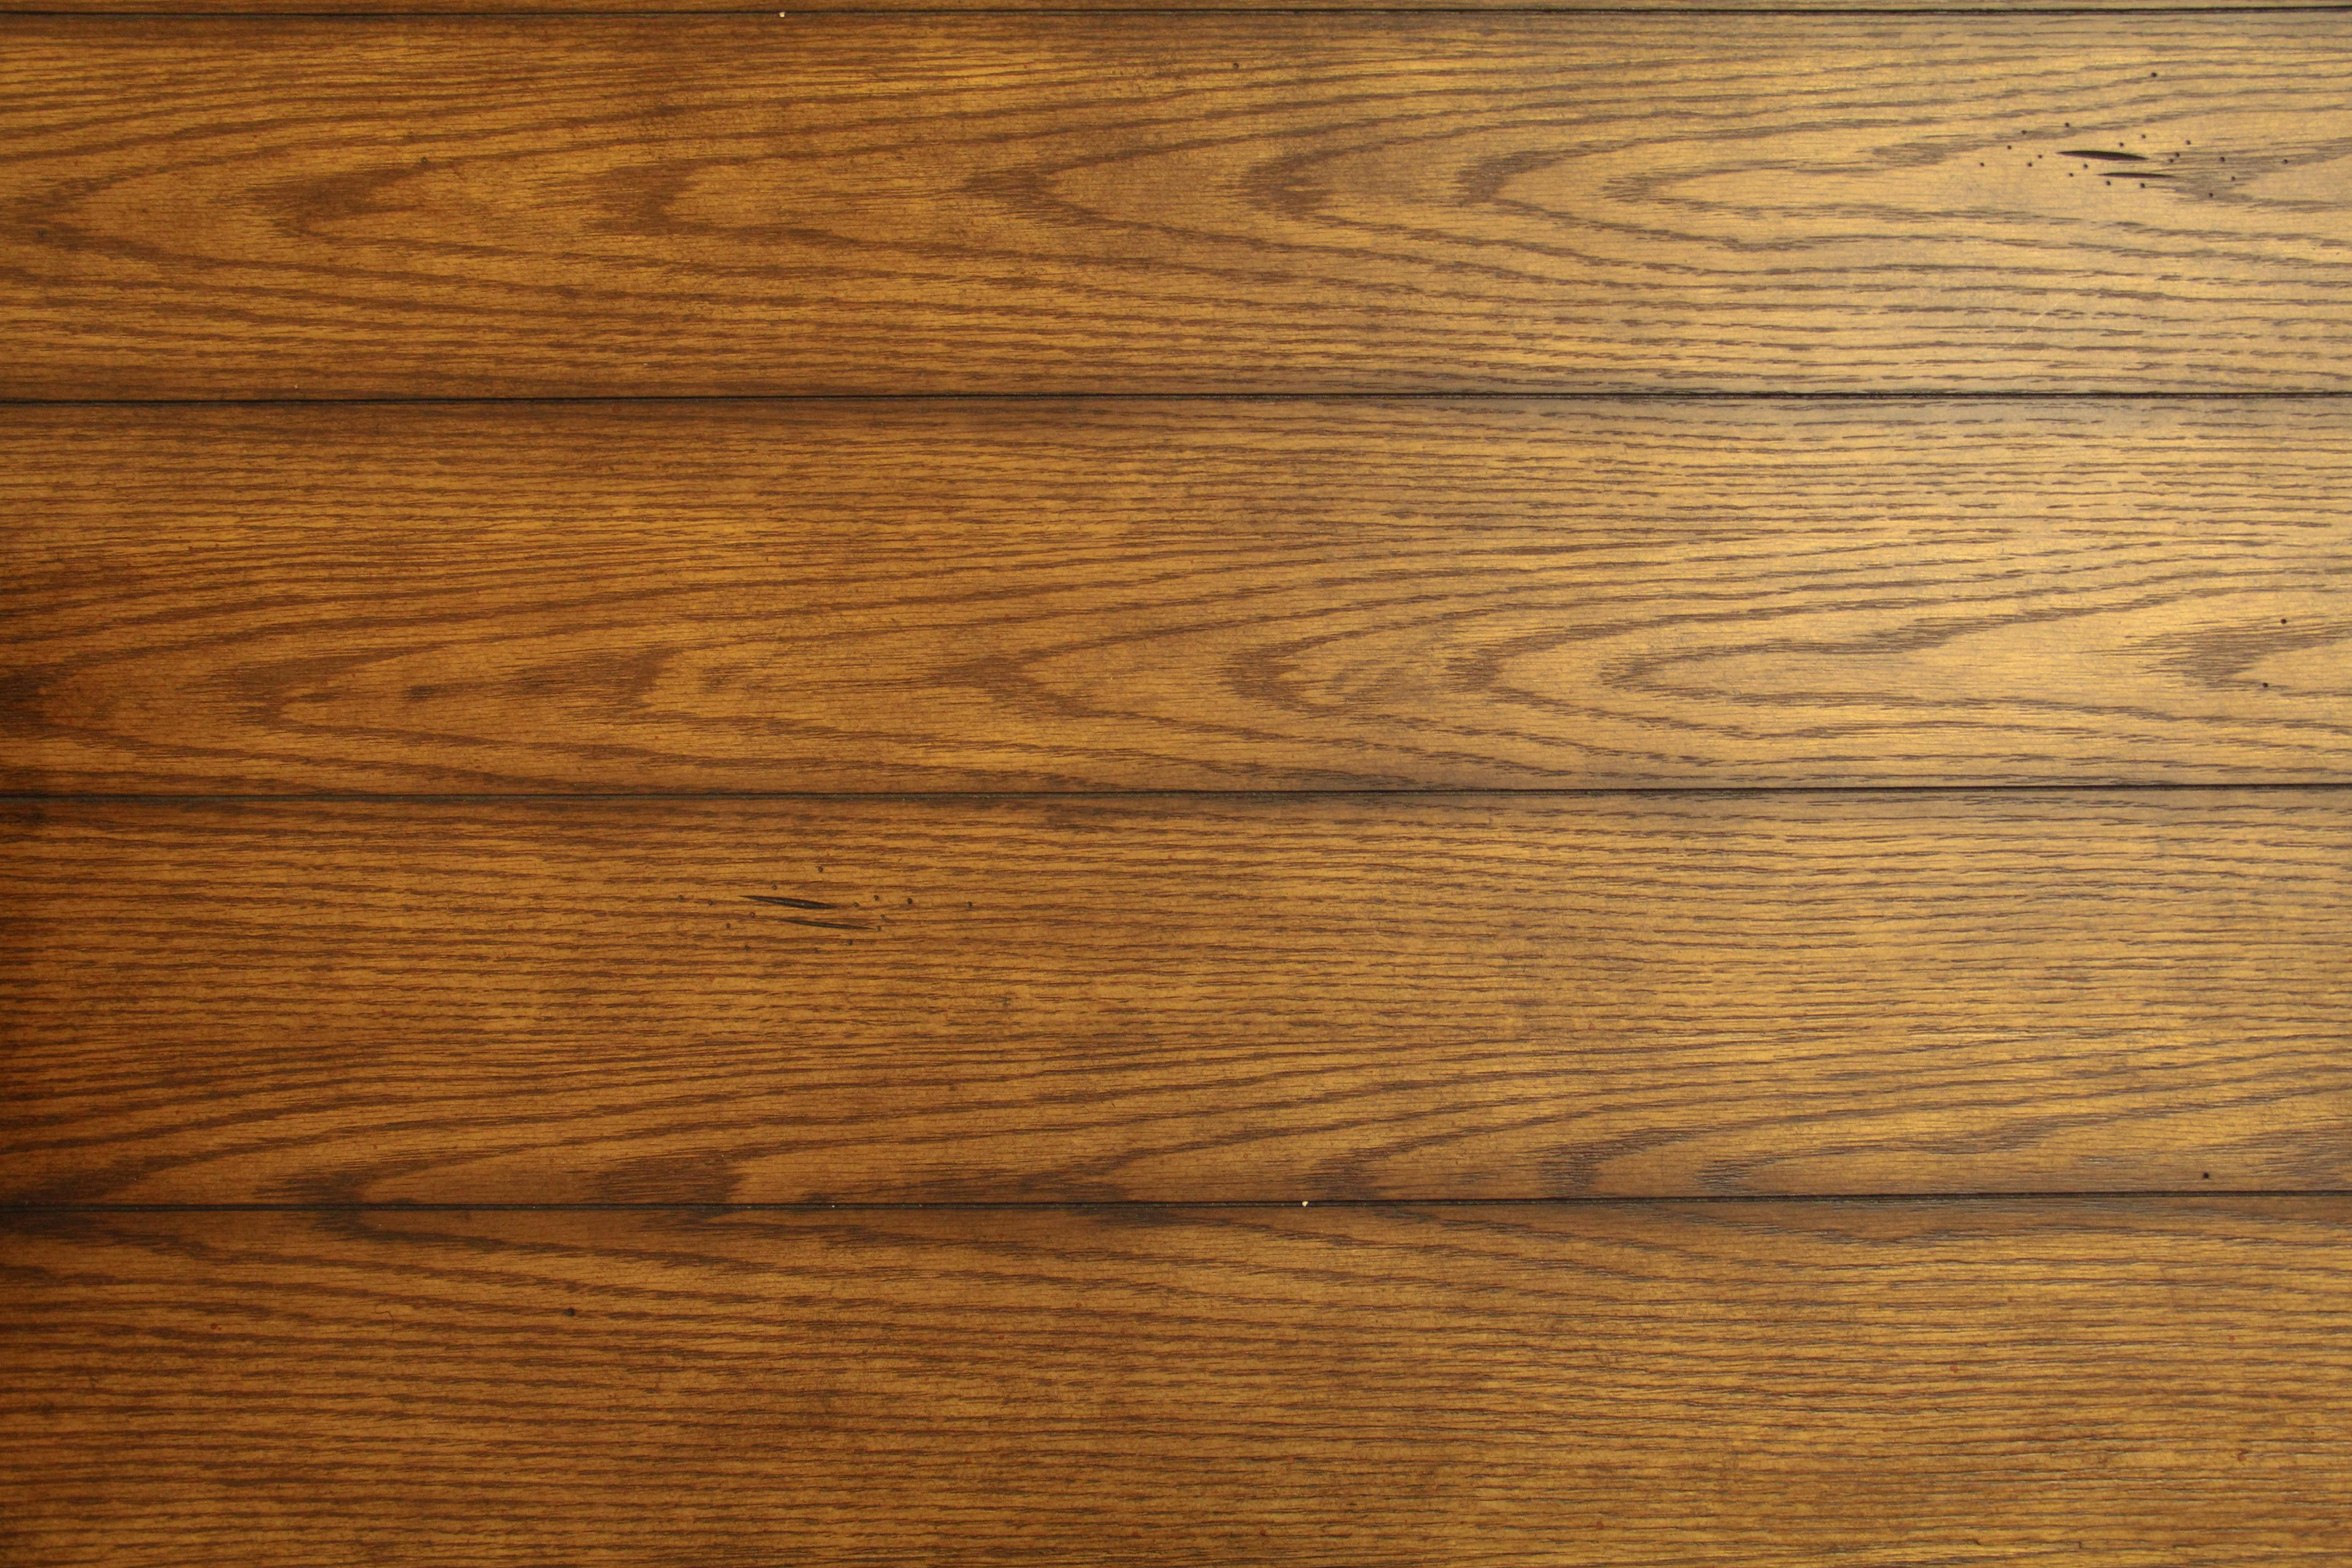 Oak Wood Grain Wallpaper WallpaperSafari : hu6vKG from www.wallpapersafari.com size 5141 x 3427 jpeg 3494kB